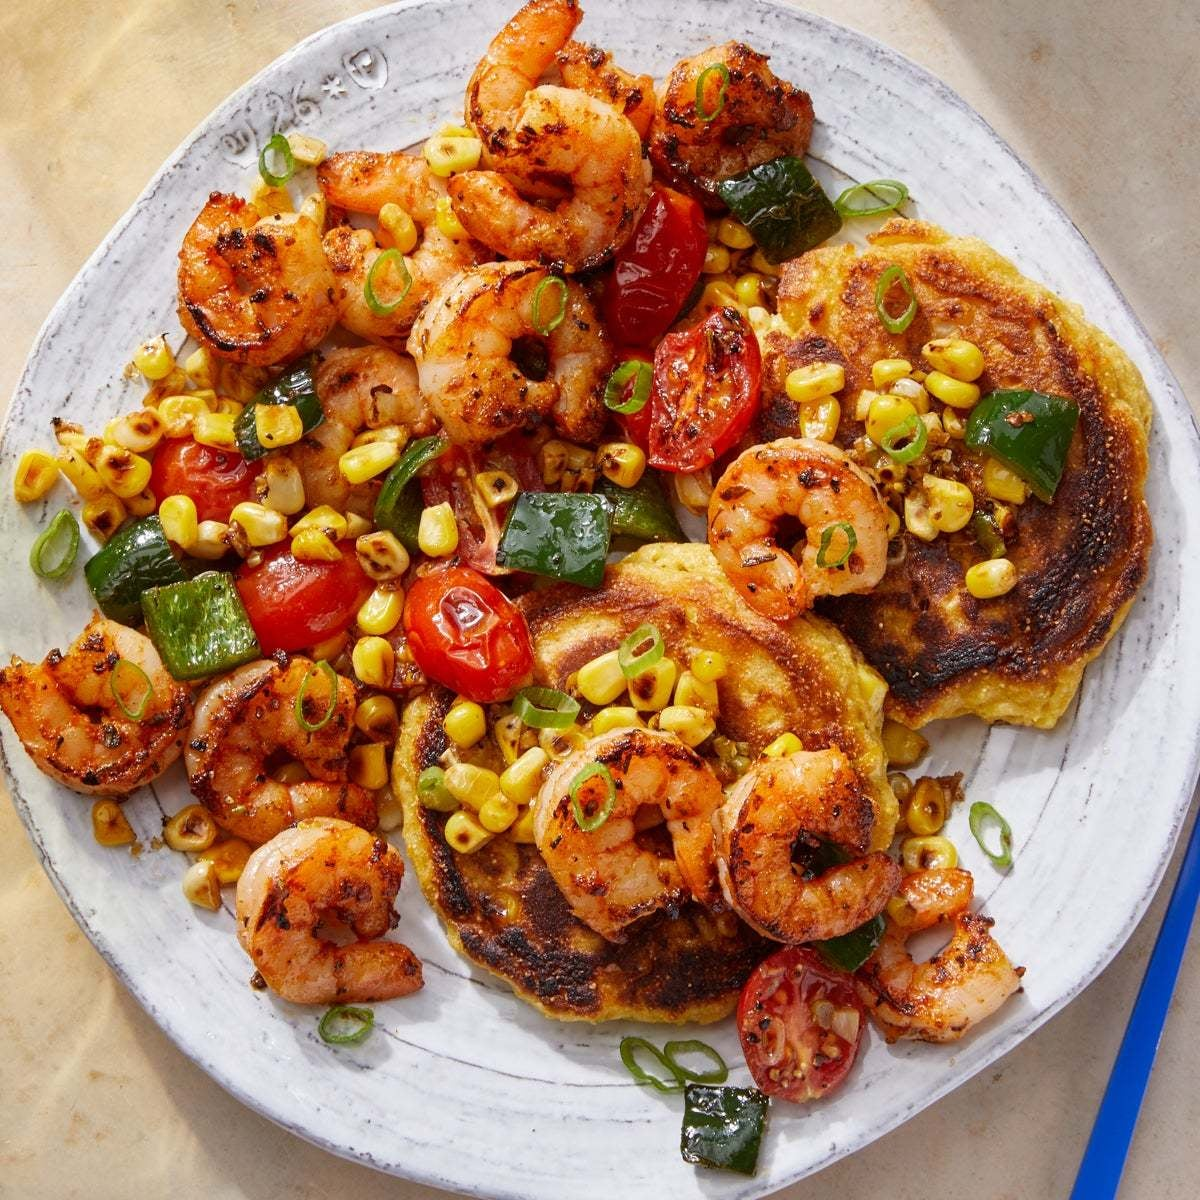 Cajun-Spiced Shrimp & Vegetables over Corn Pancakes